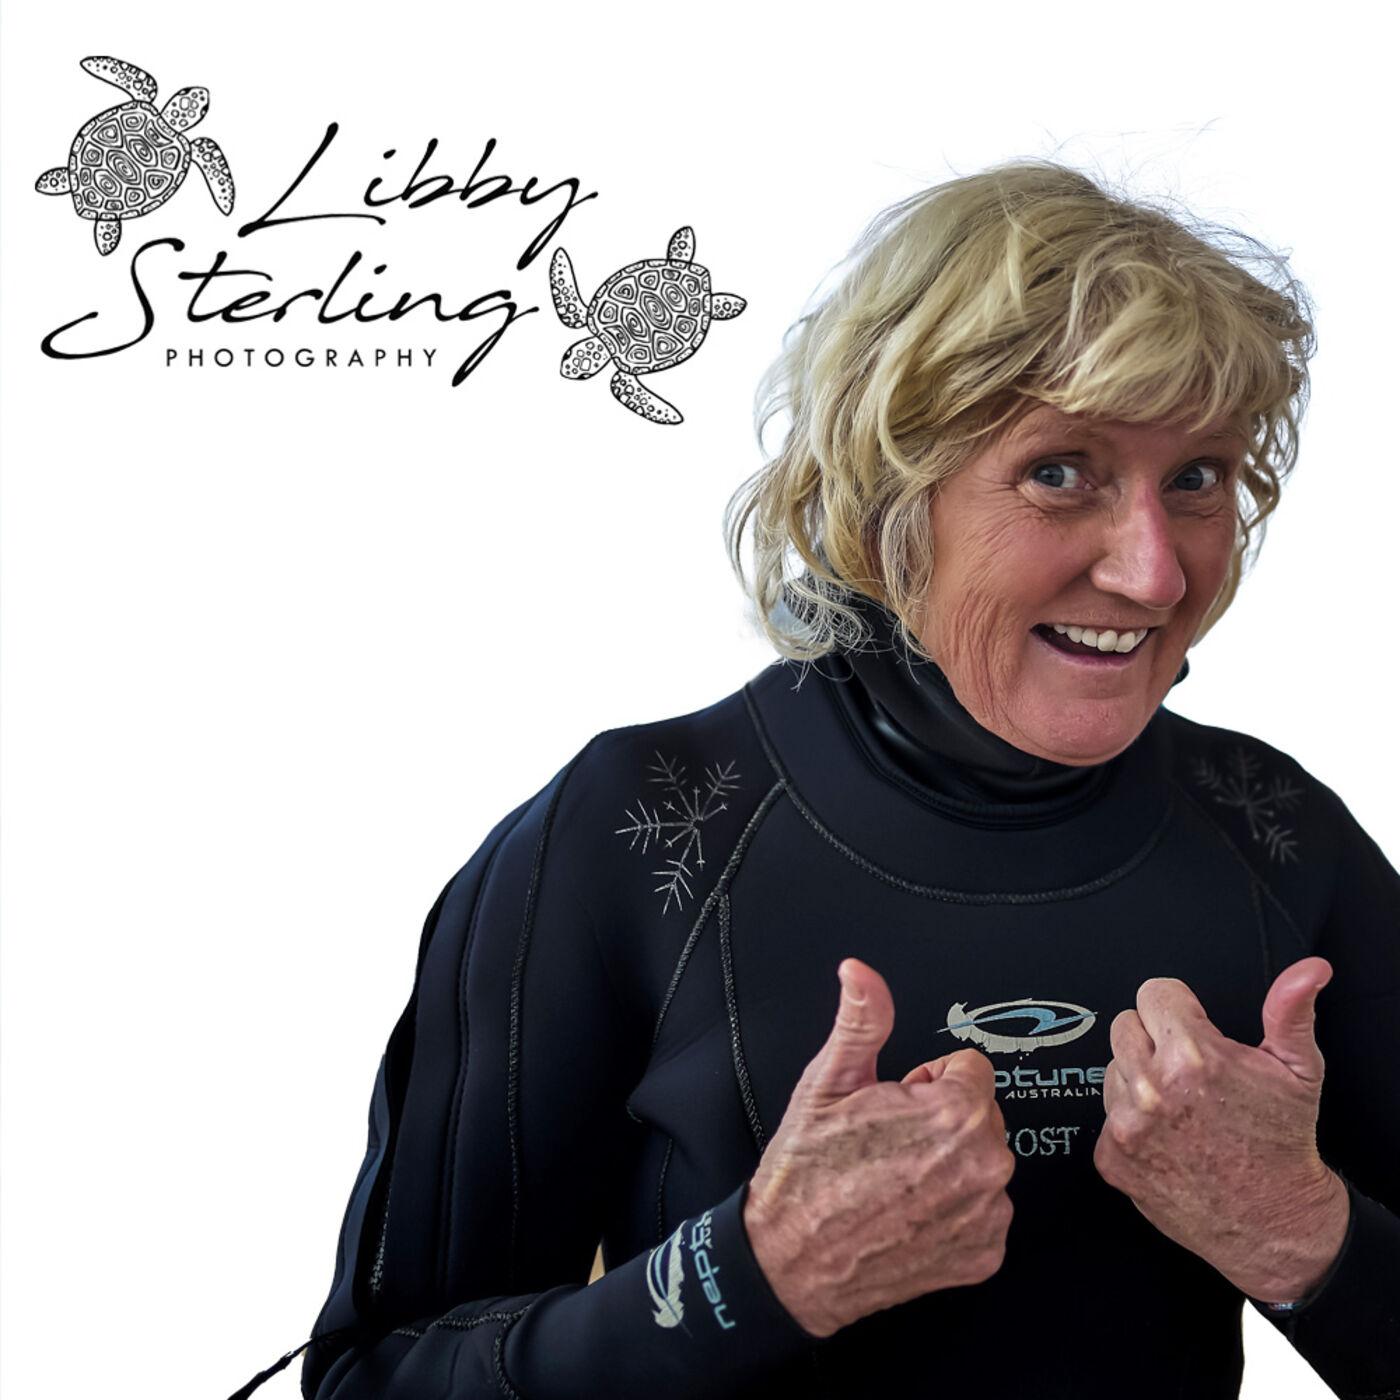 Libby Sterling - Cairns, cameras & courses - S2 E03